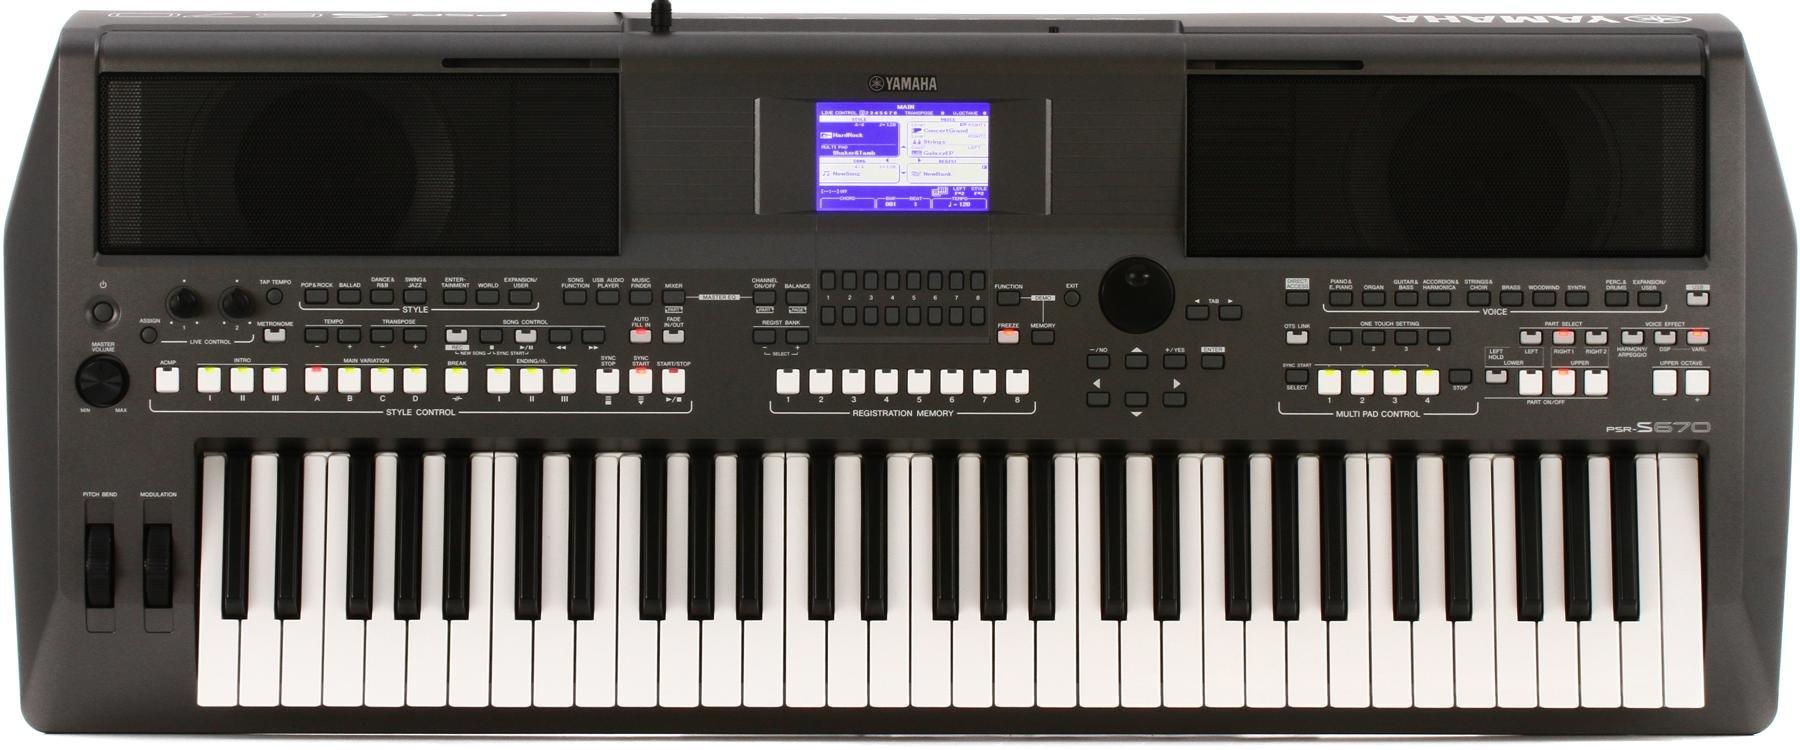 Yamaha PSR-S670 61-key Arranger Workstation | Sweetwater